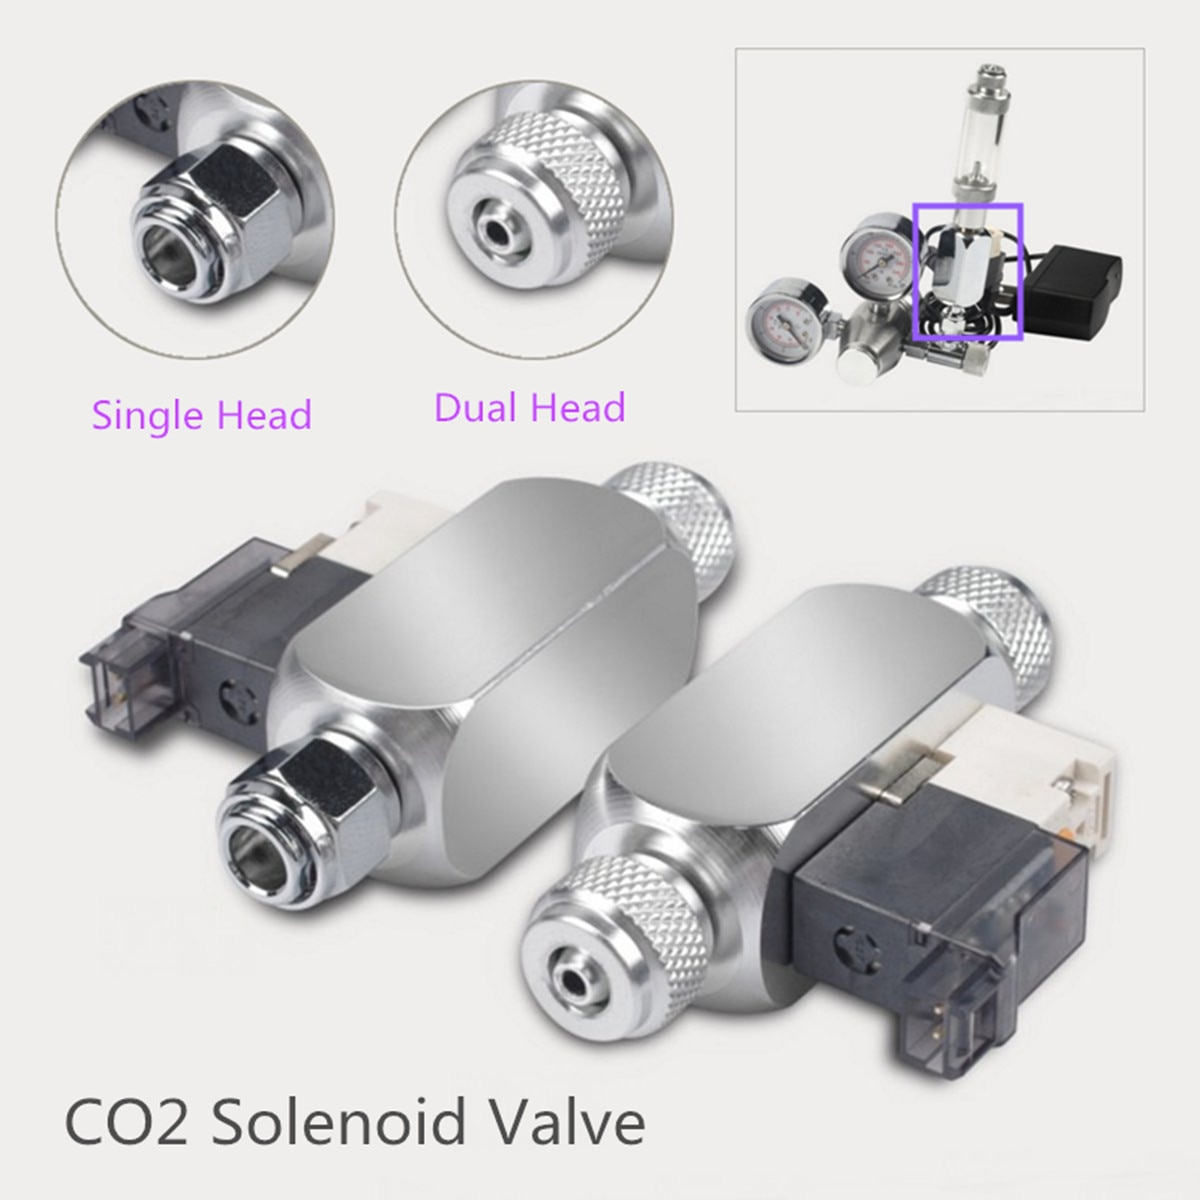 Magnetic CO2 Aquarium Solenoid Single Dual Head Valve Low Temp Regulator Cylinder Pressure Relief CO2 Equipments Supplies Tools